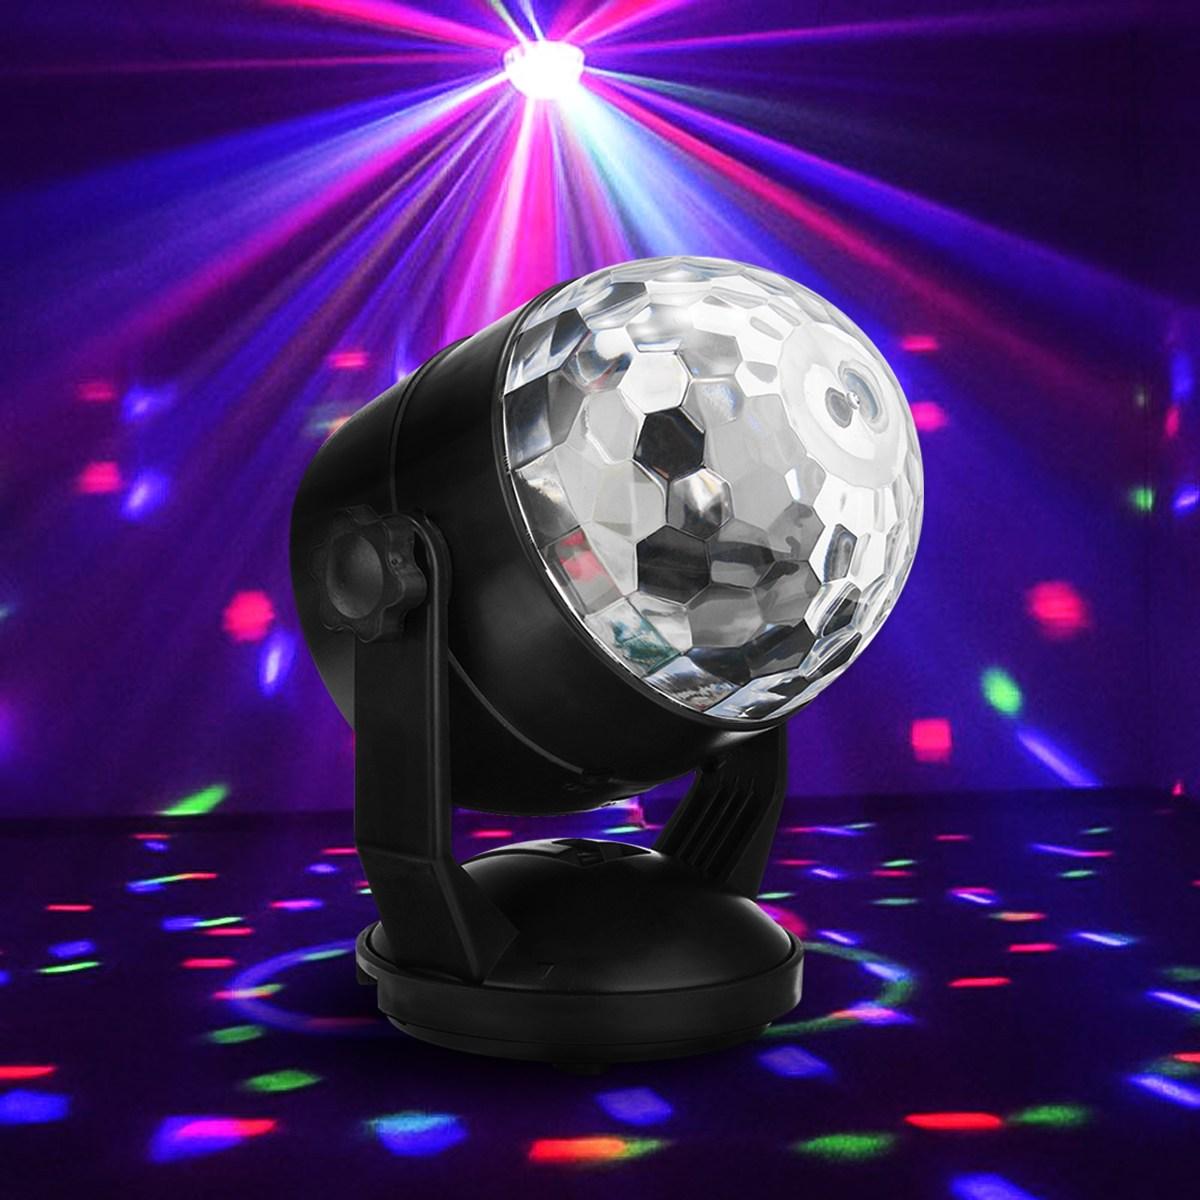 Magic Ball Auto LED RGB Stage Light Voice Sound Control Night Lamp USB Battery Power Disco Crystal DJ Club Bar Party Decor mlb 3 magic ball style 4w auto rgb led stage light black ac 90 240v